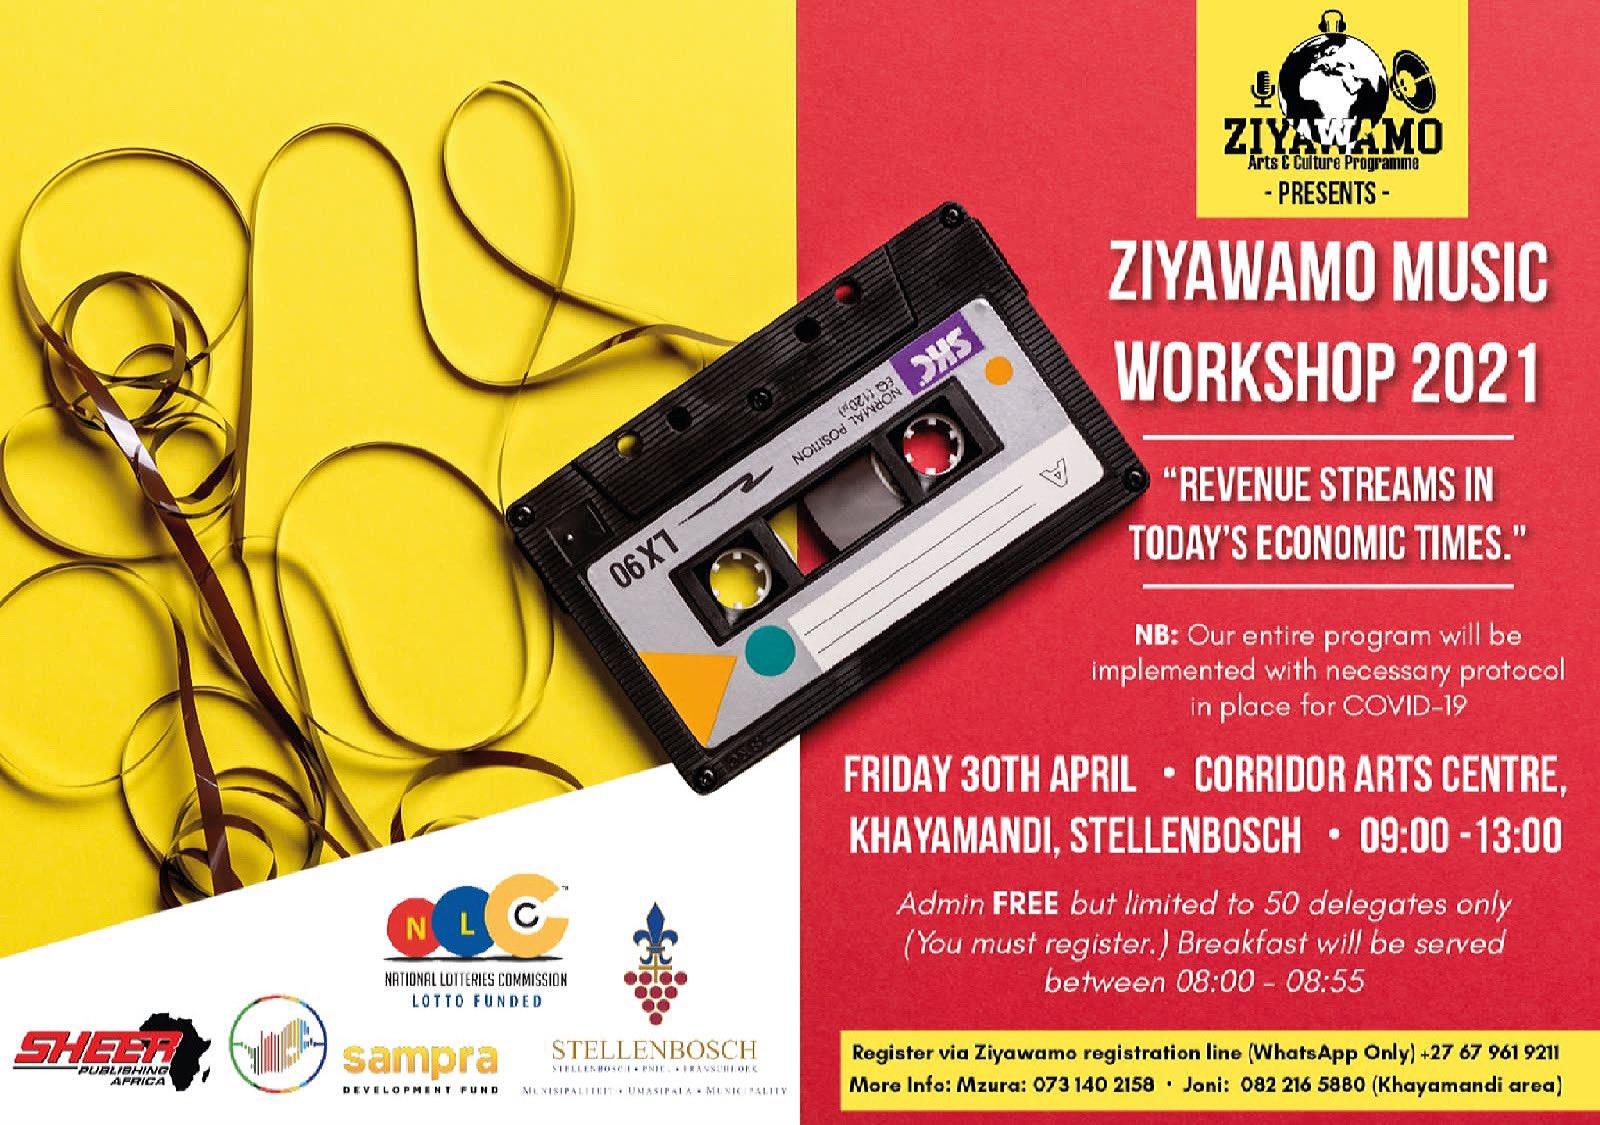 Ziyawamo Museuc Workshop 2021